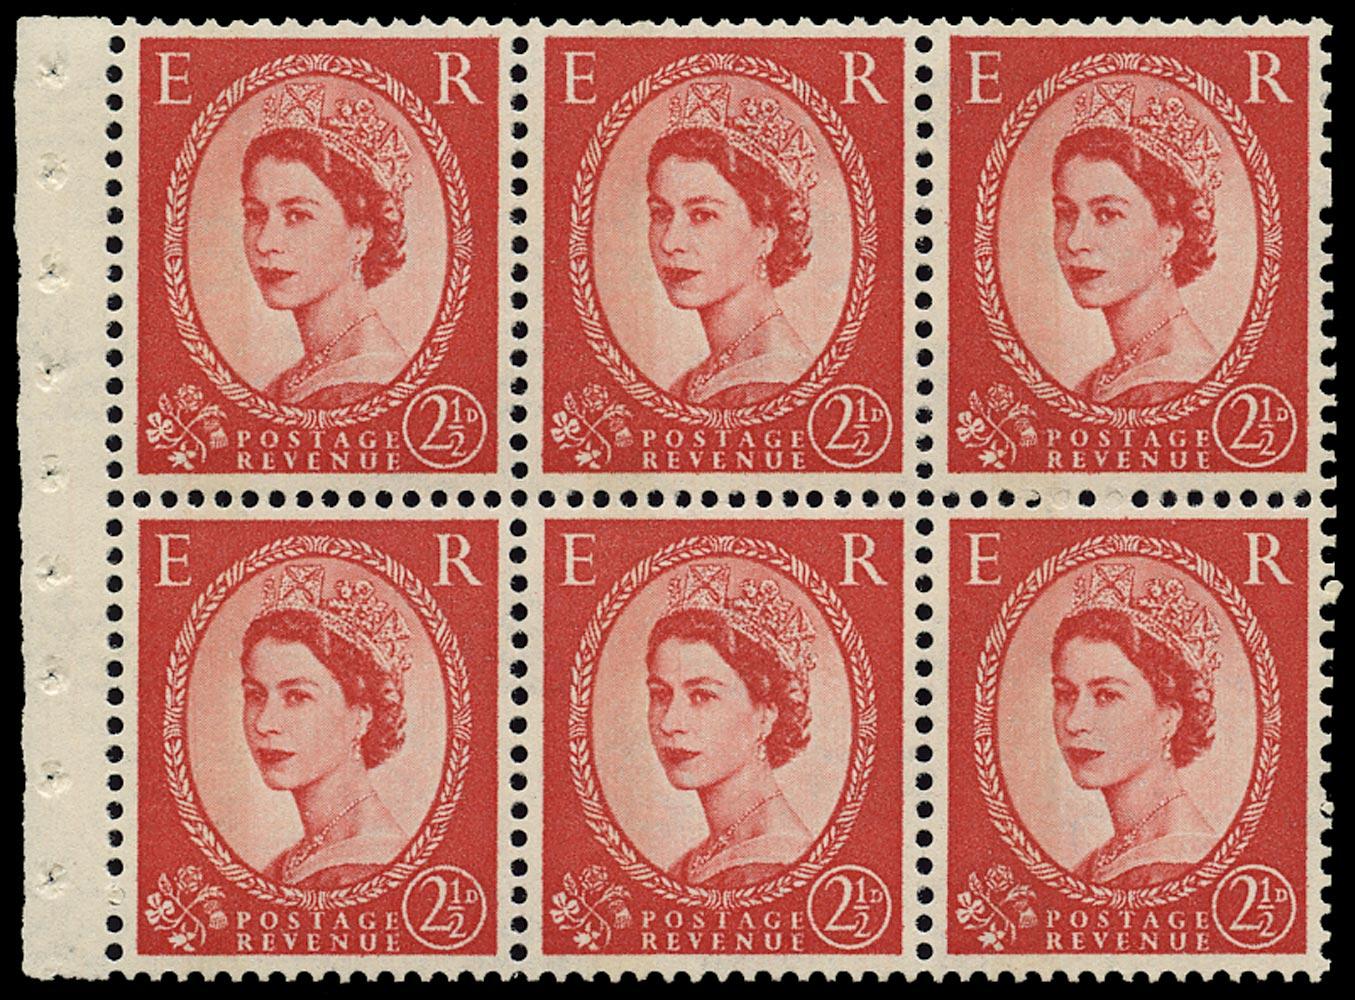 GB 1962  SG614al Booklet pane - Wmk. Crowns, One band blue Phosphor